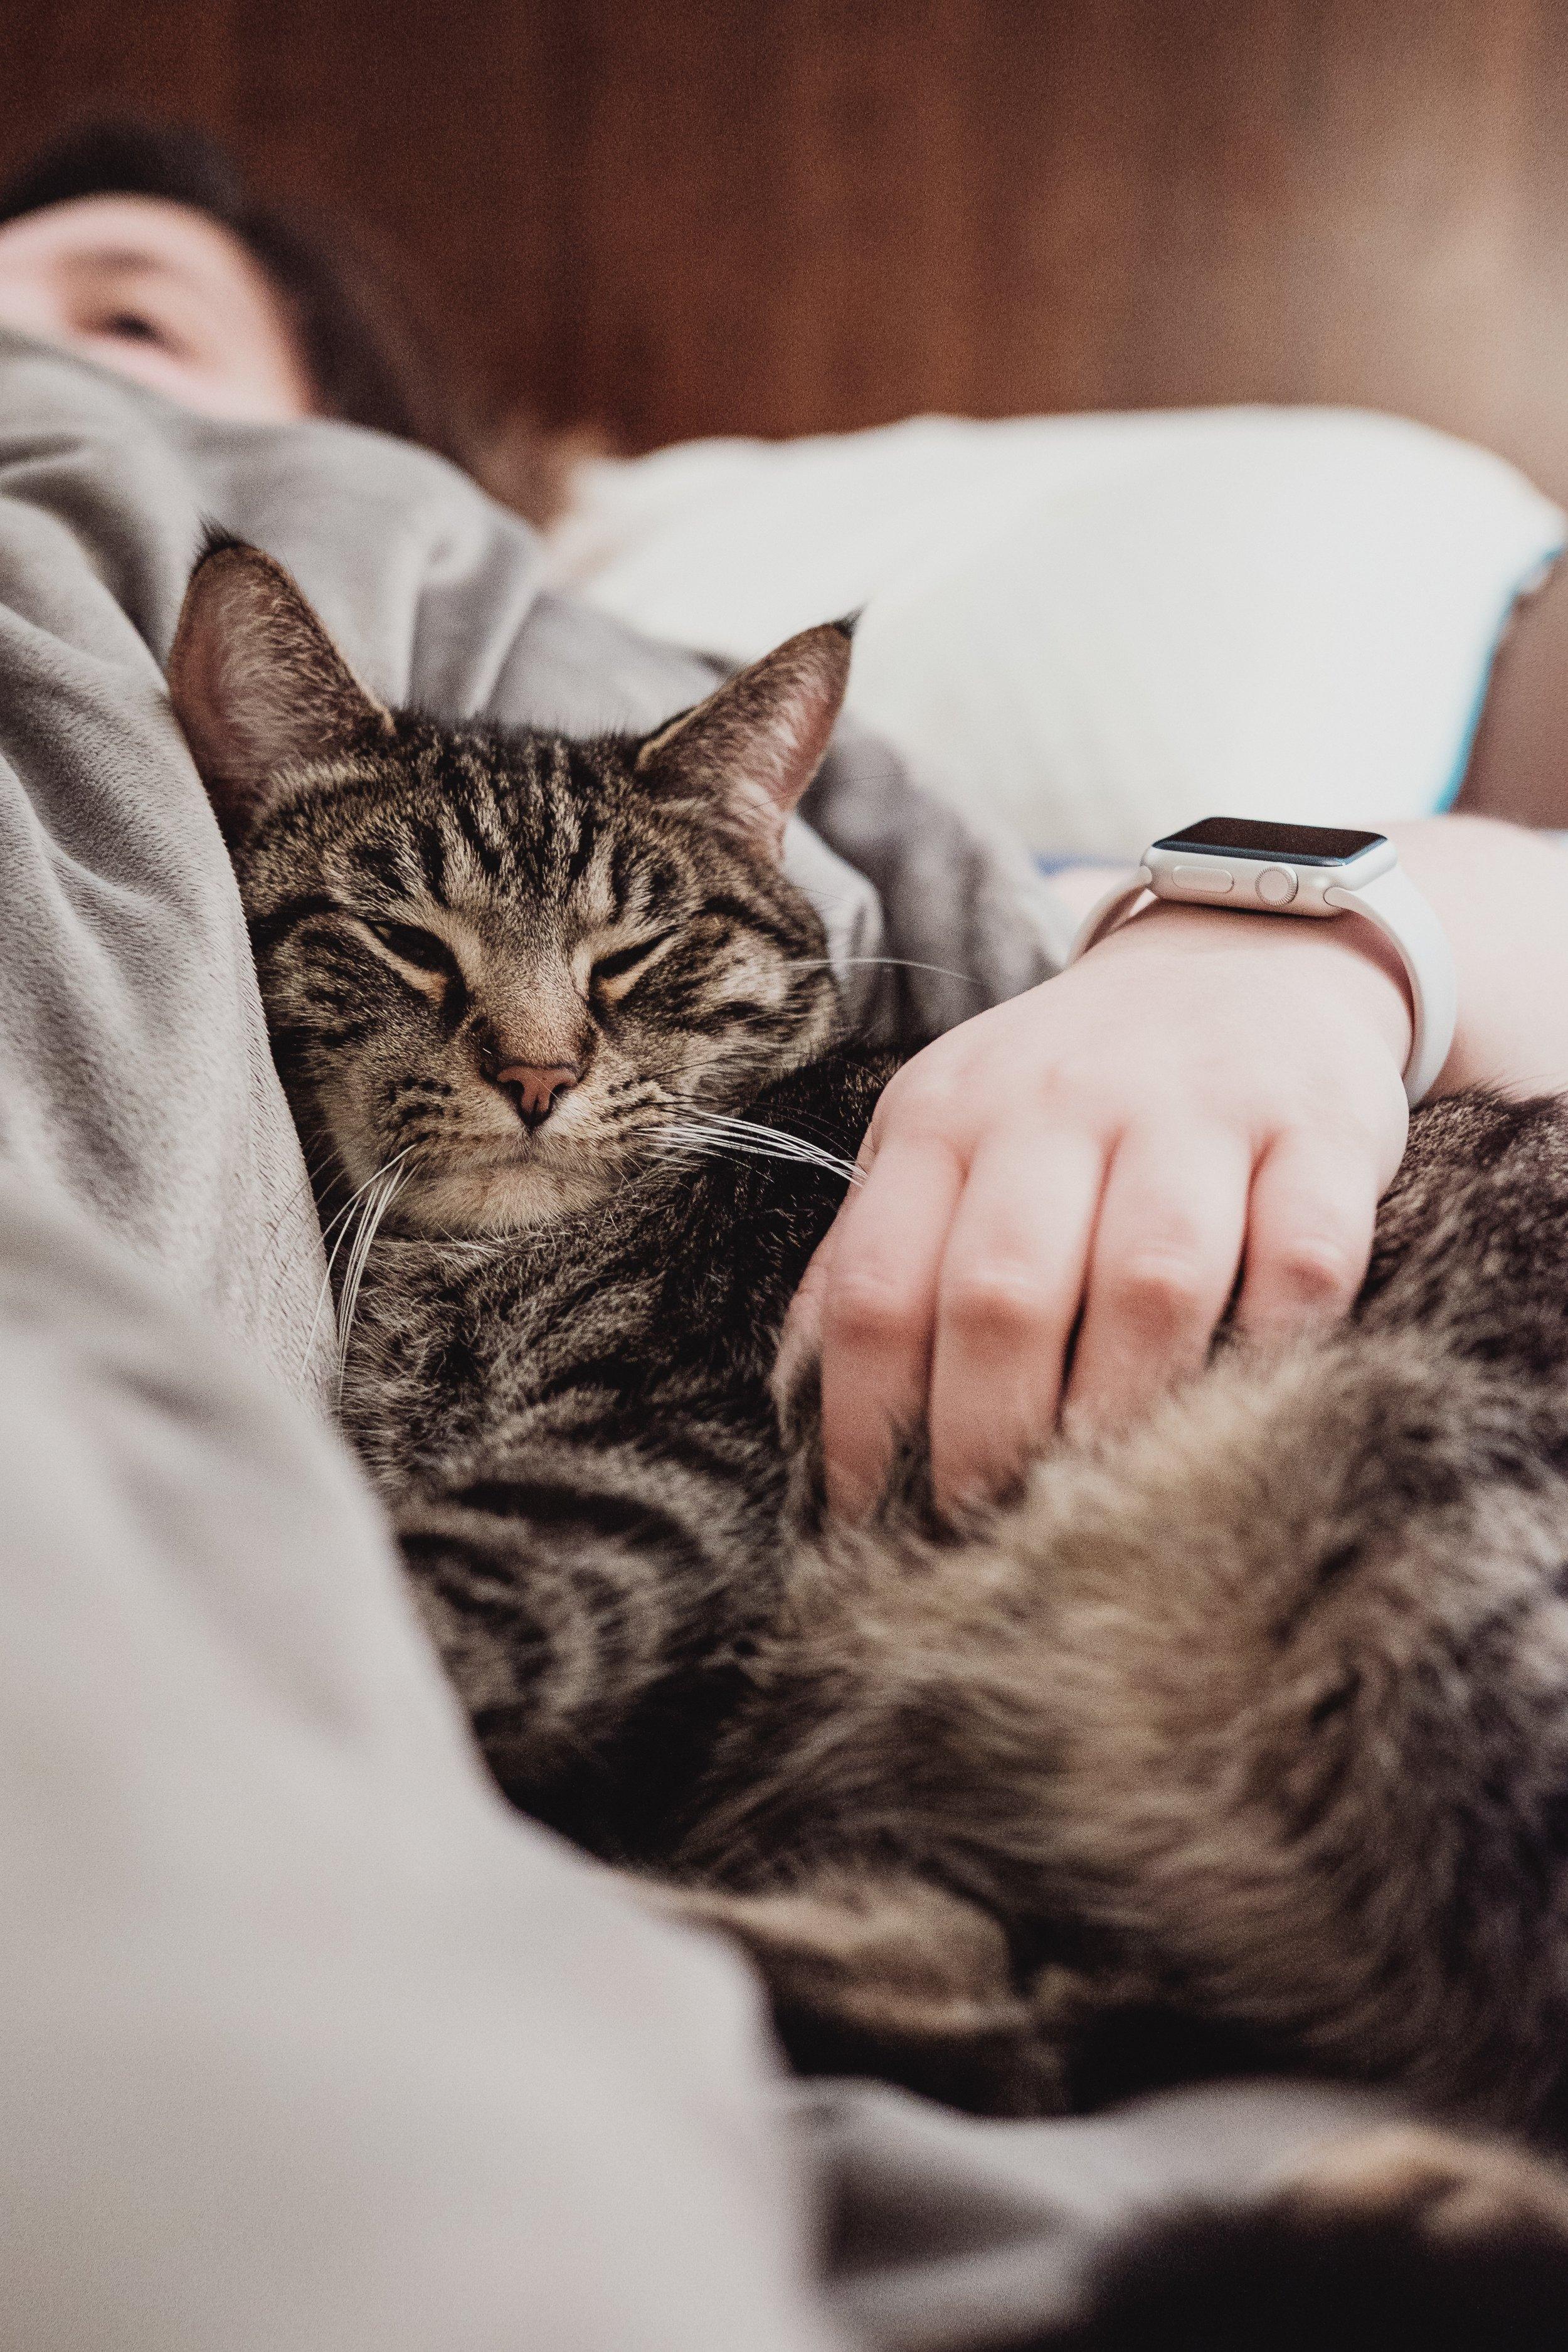 cat sleeping next to woman